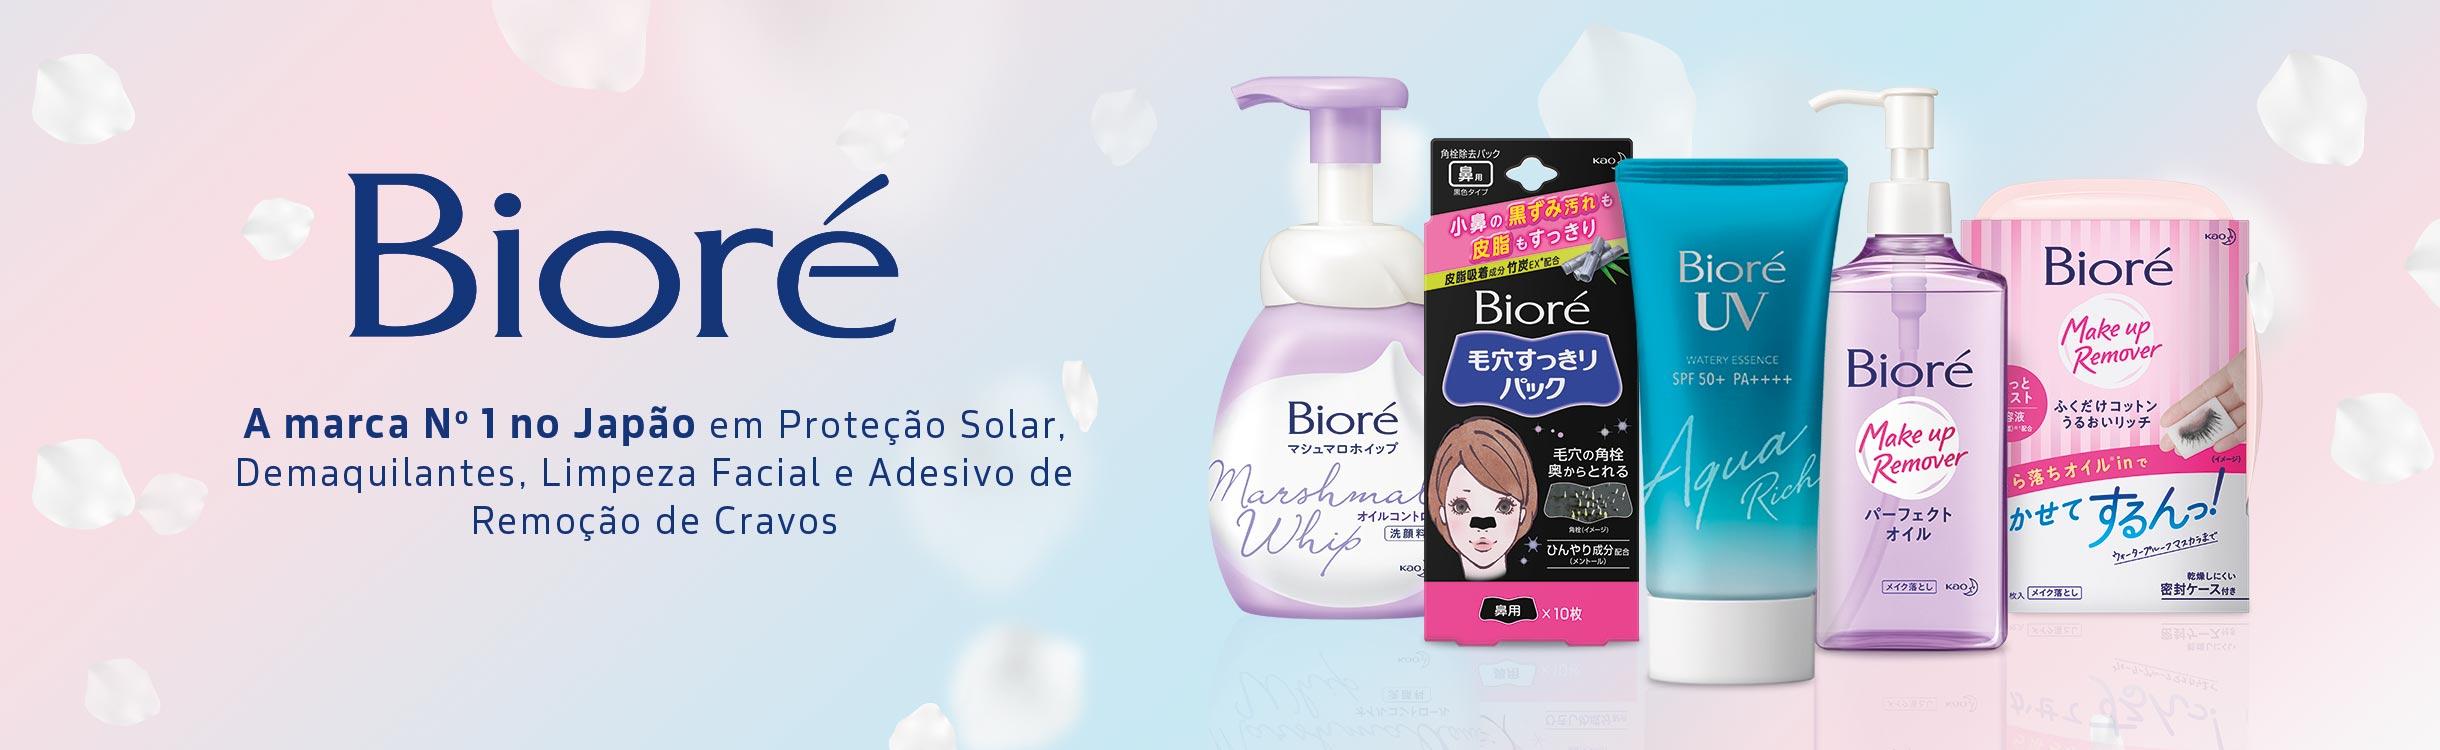 Bioré/Cuidados para Pele/Rosto/Máscara